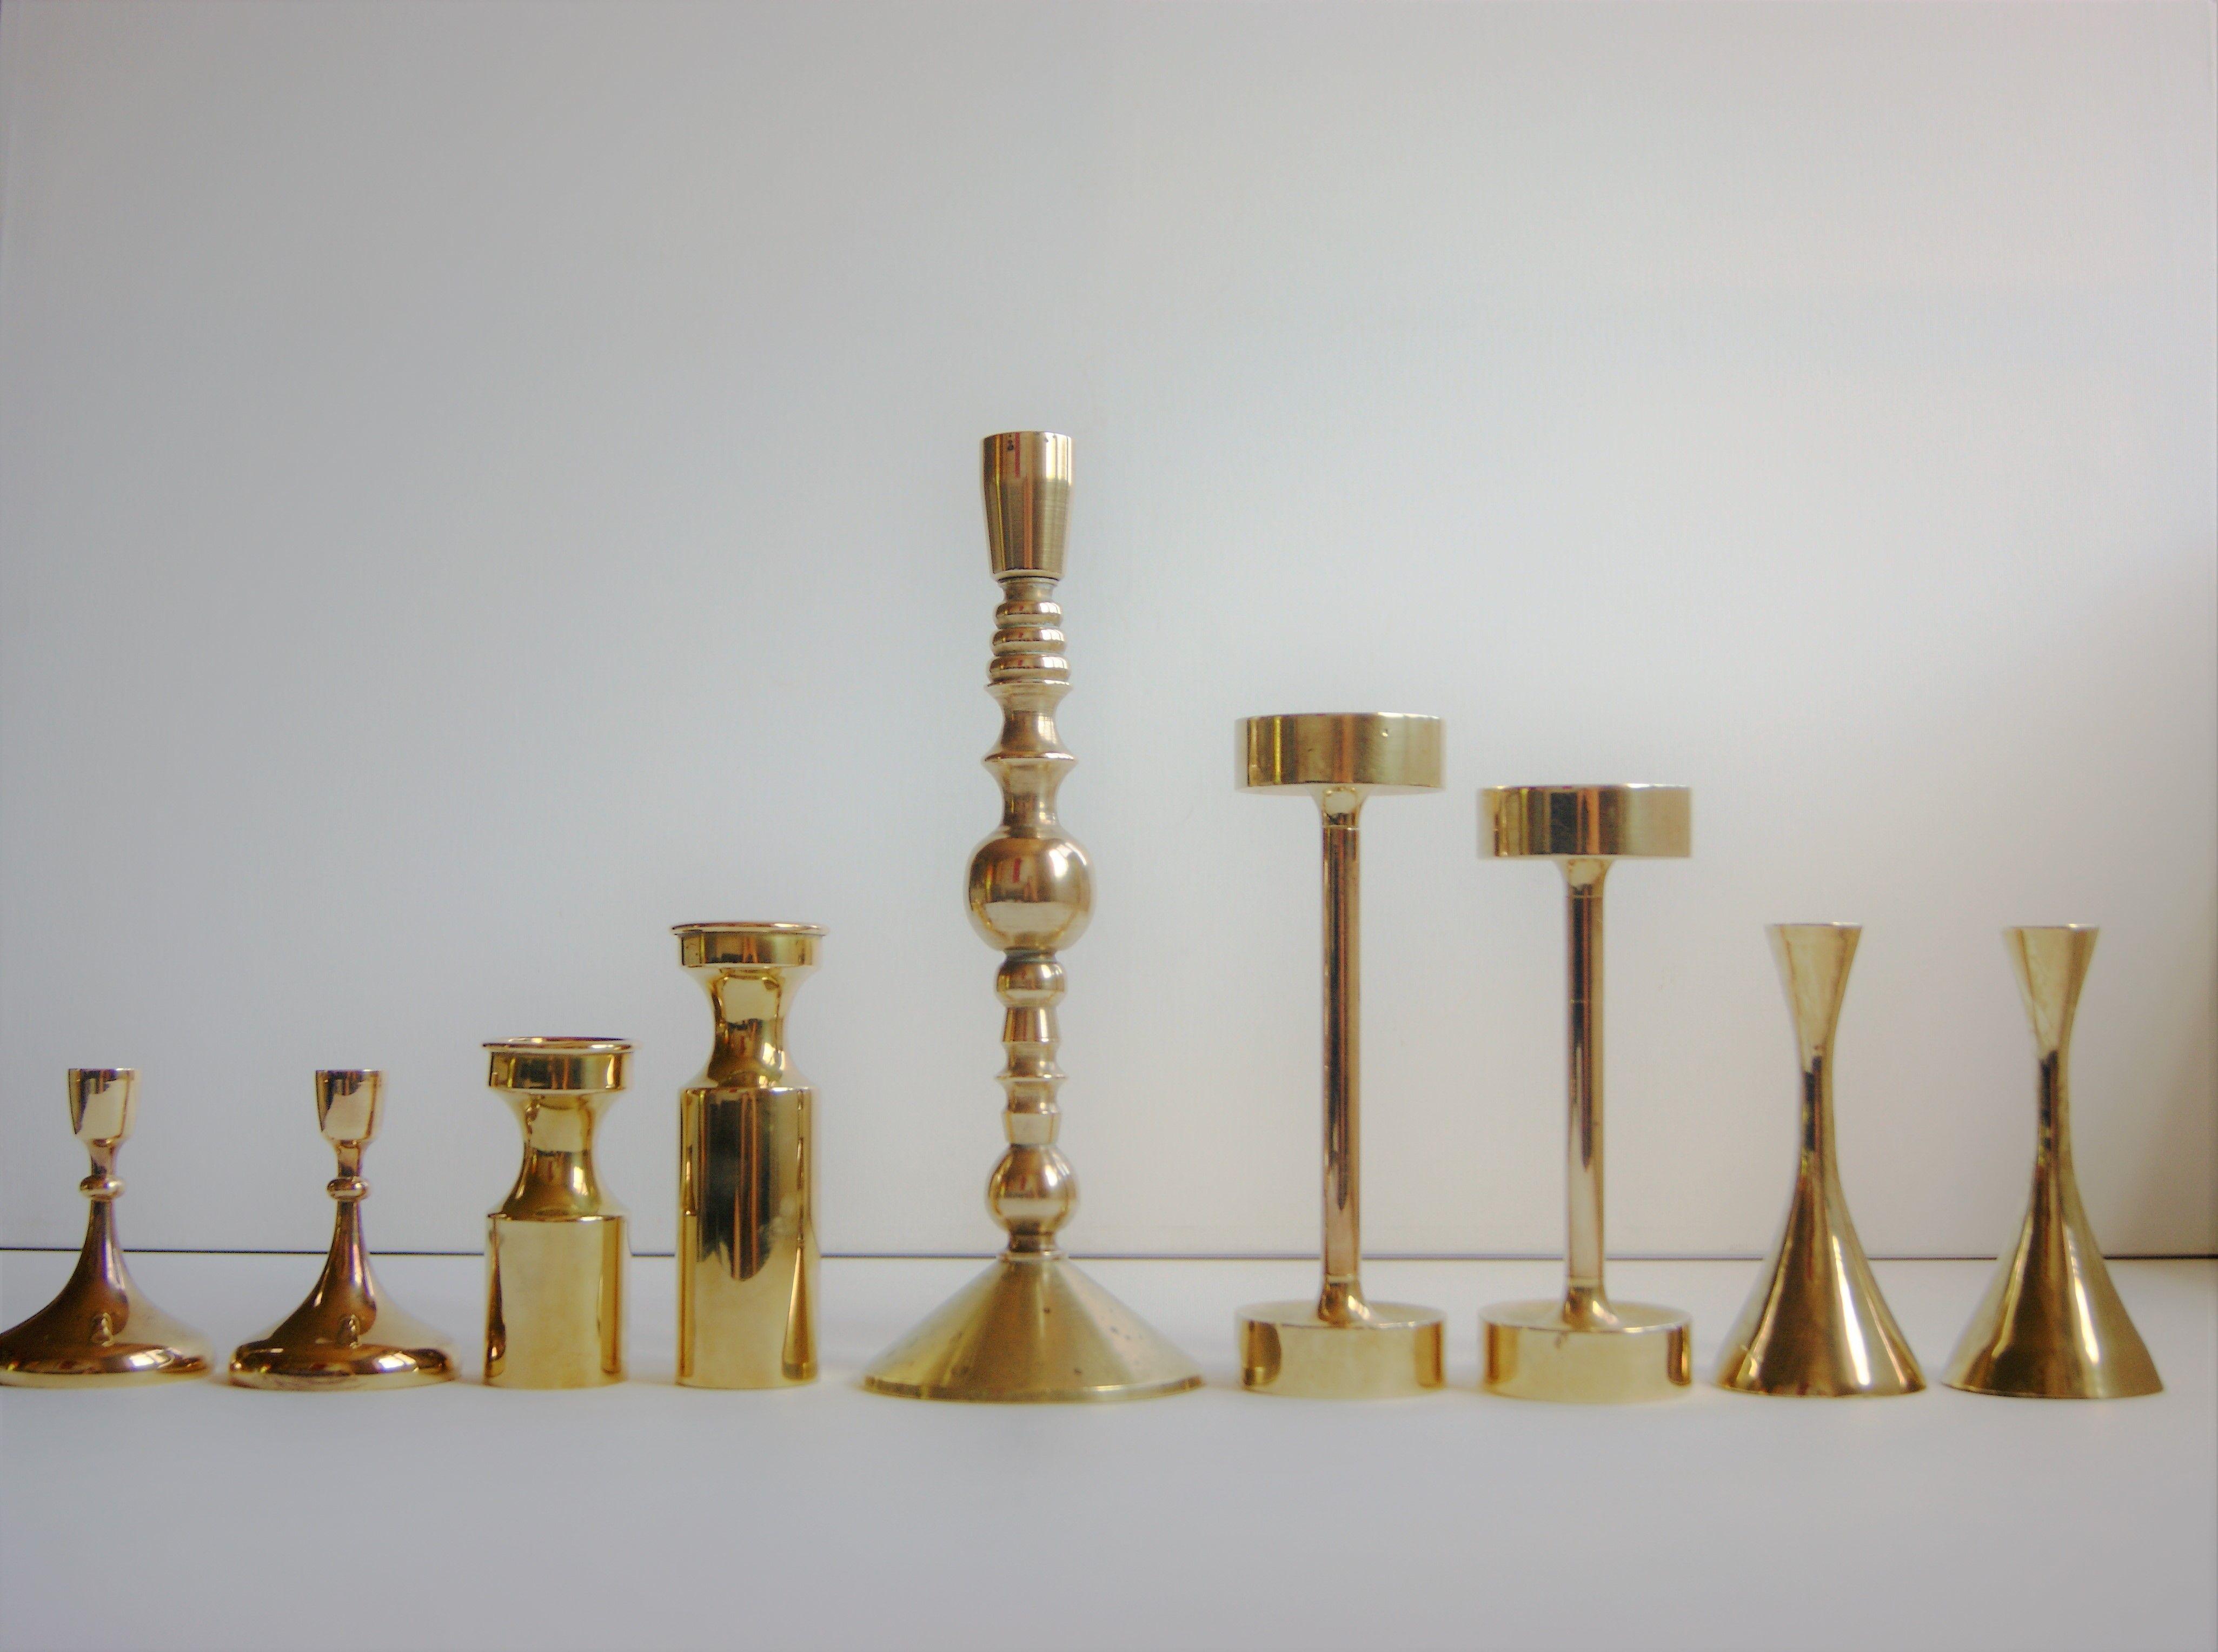 Vintage Brass Candle Holders Scandinavian Midcentury Design I 2020